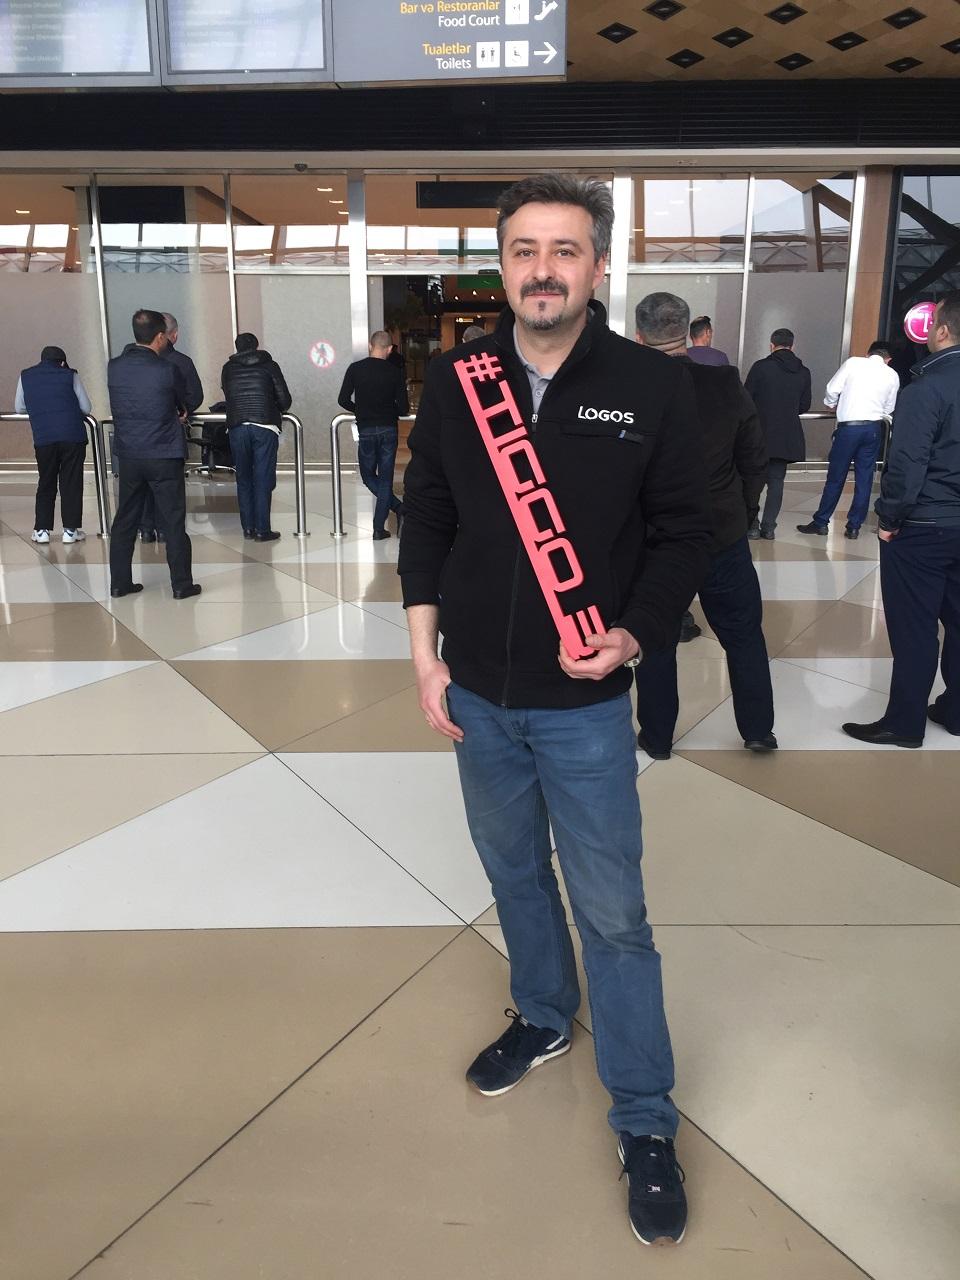 Пресс тур Chery начался со встречи журналистов в аэропорту Баку. У нас в руках пластиковый хештег